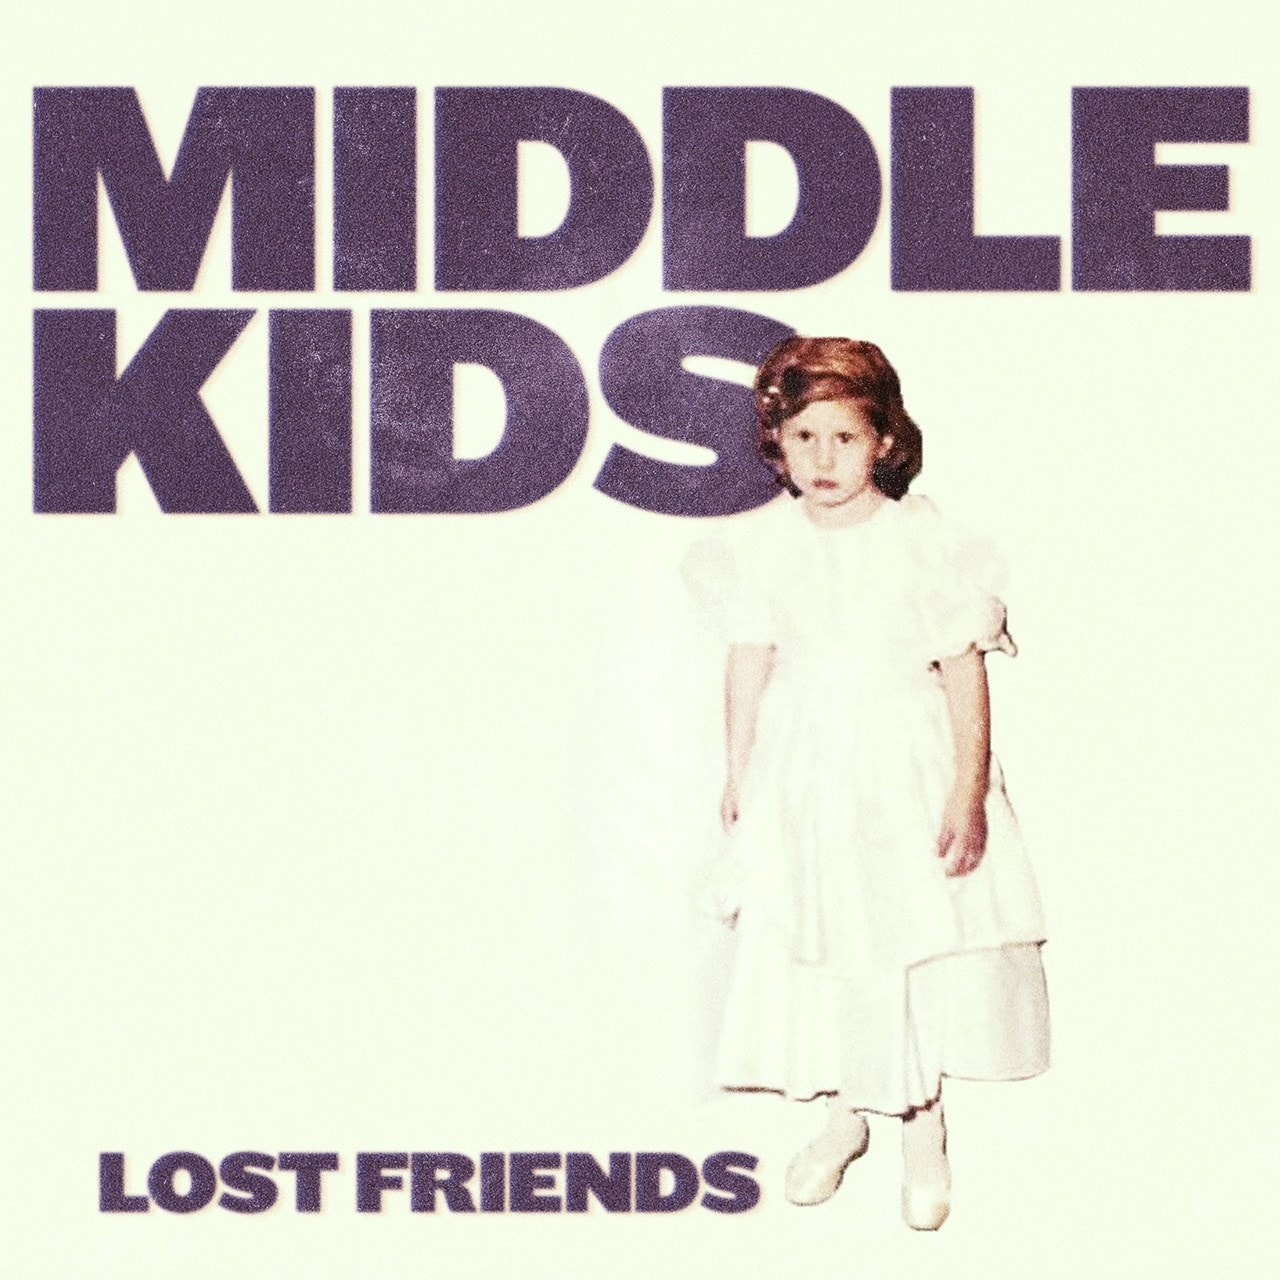 Lost Friends - 1